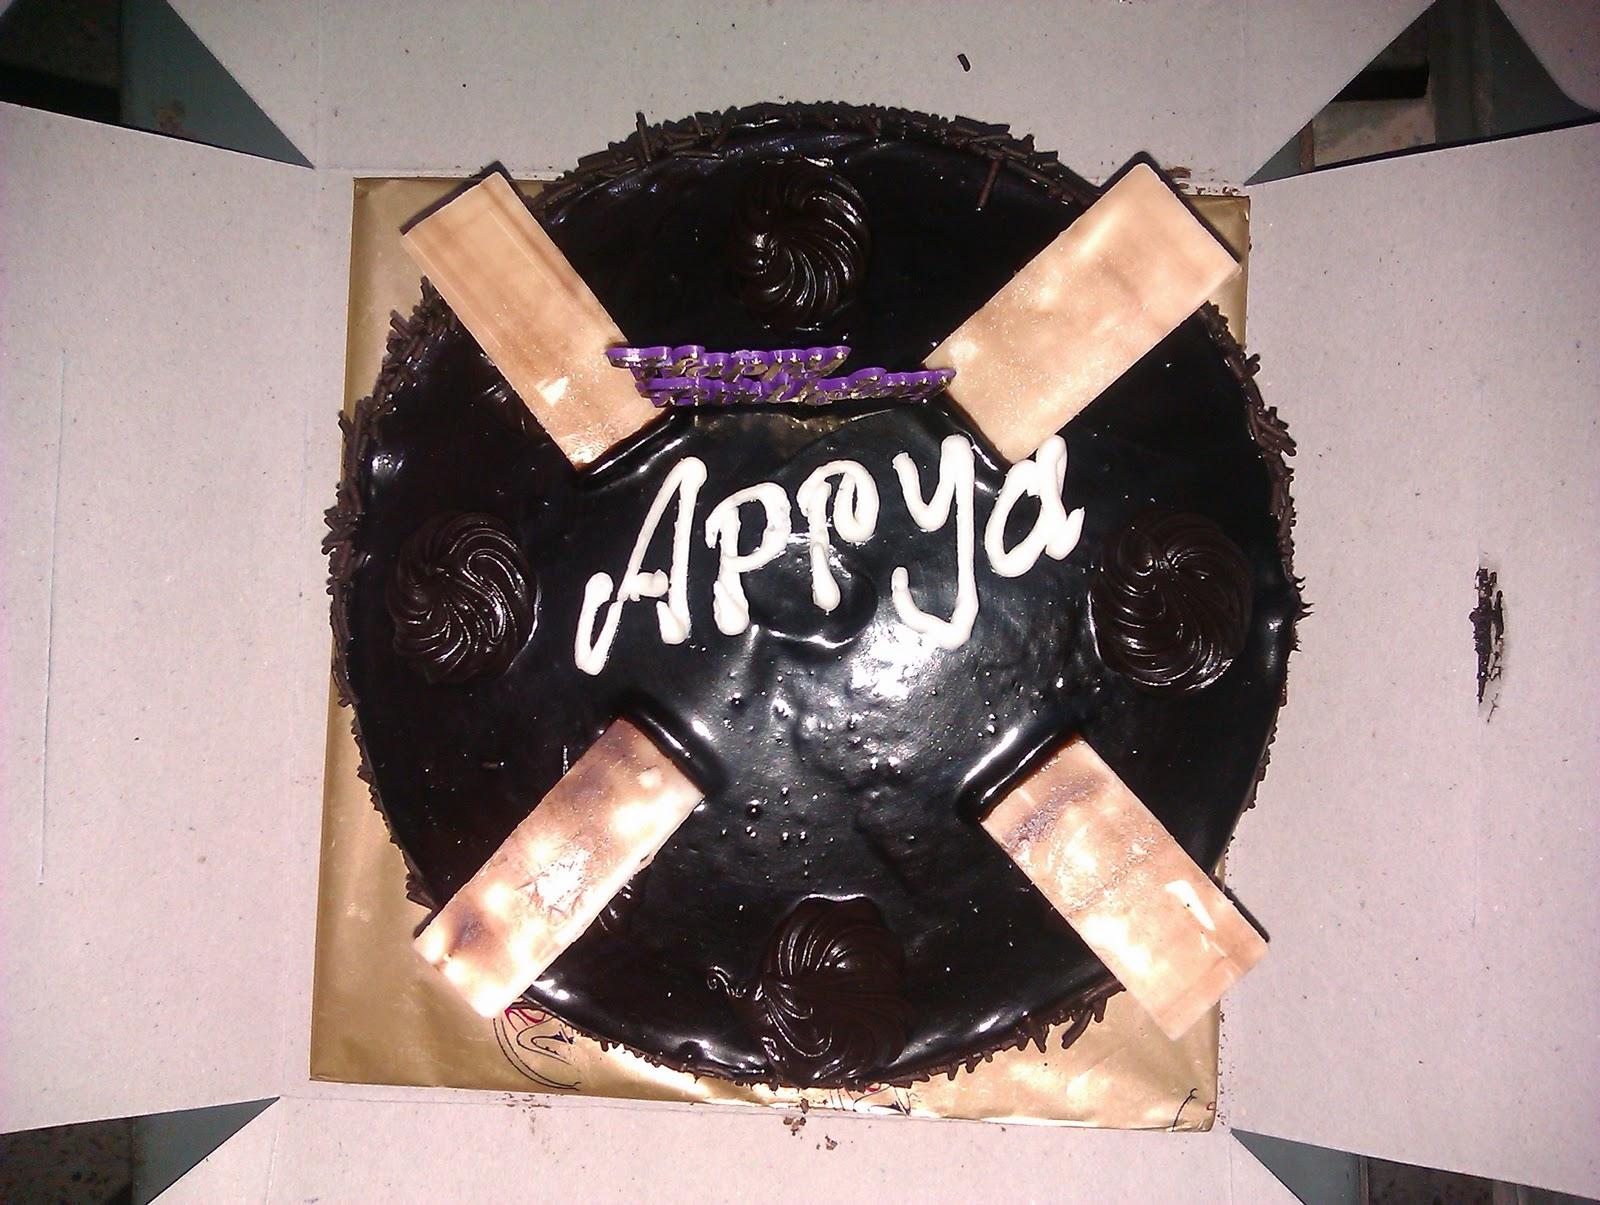 Cake Images Sagar : MY LIFE AND THINGS AROUND IT: HAPPY BIRTHDAY SAGAR (APPU)